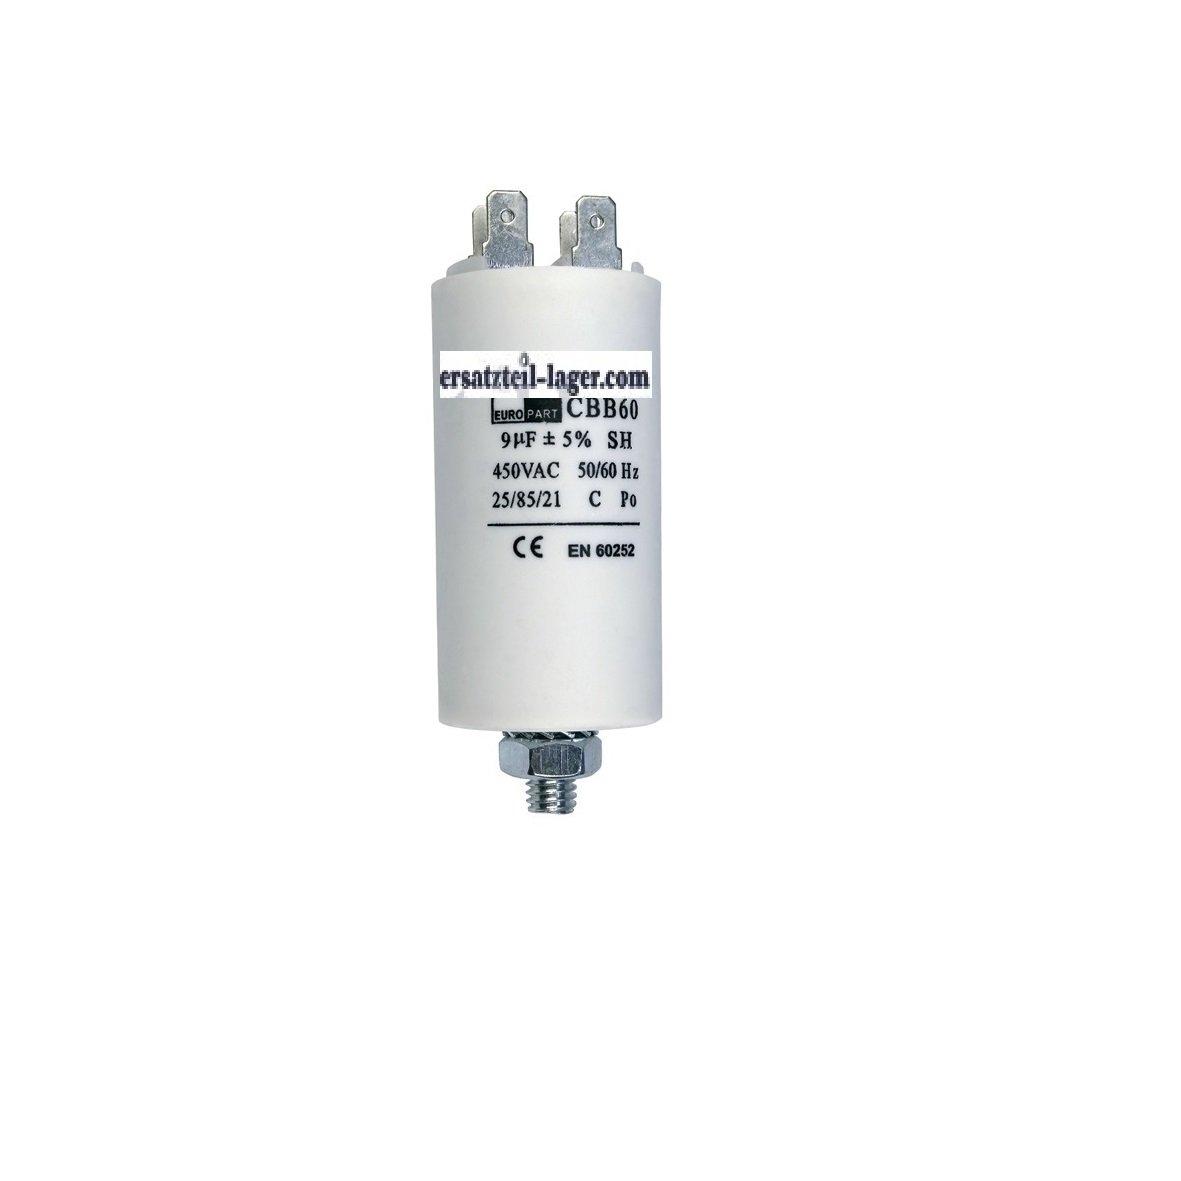 Kondensator Anlaufkondensator Motorkondensator 9 µF 450V mit AMP-Steckfahnen